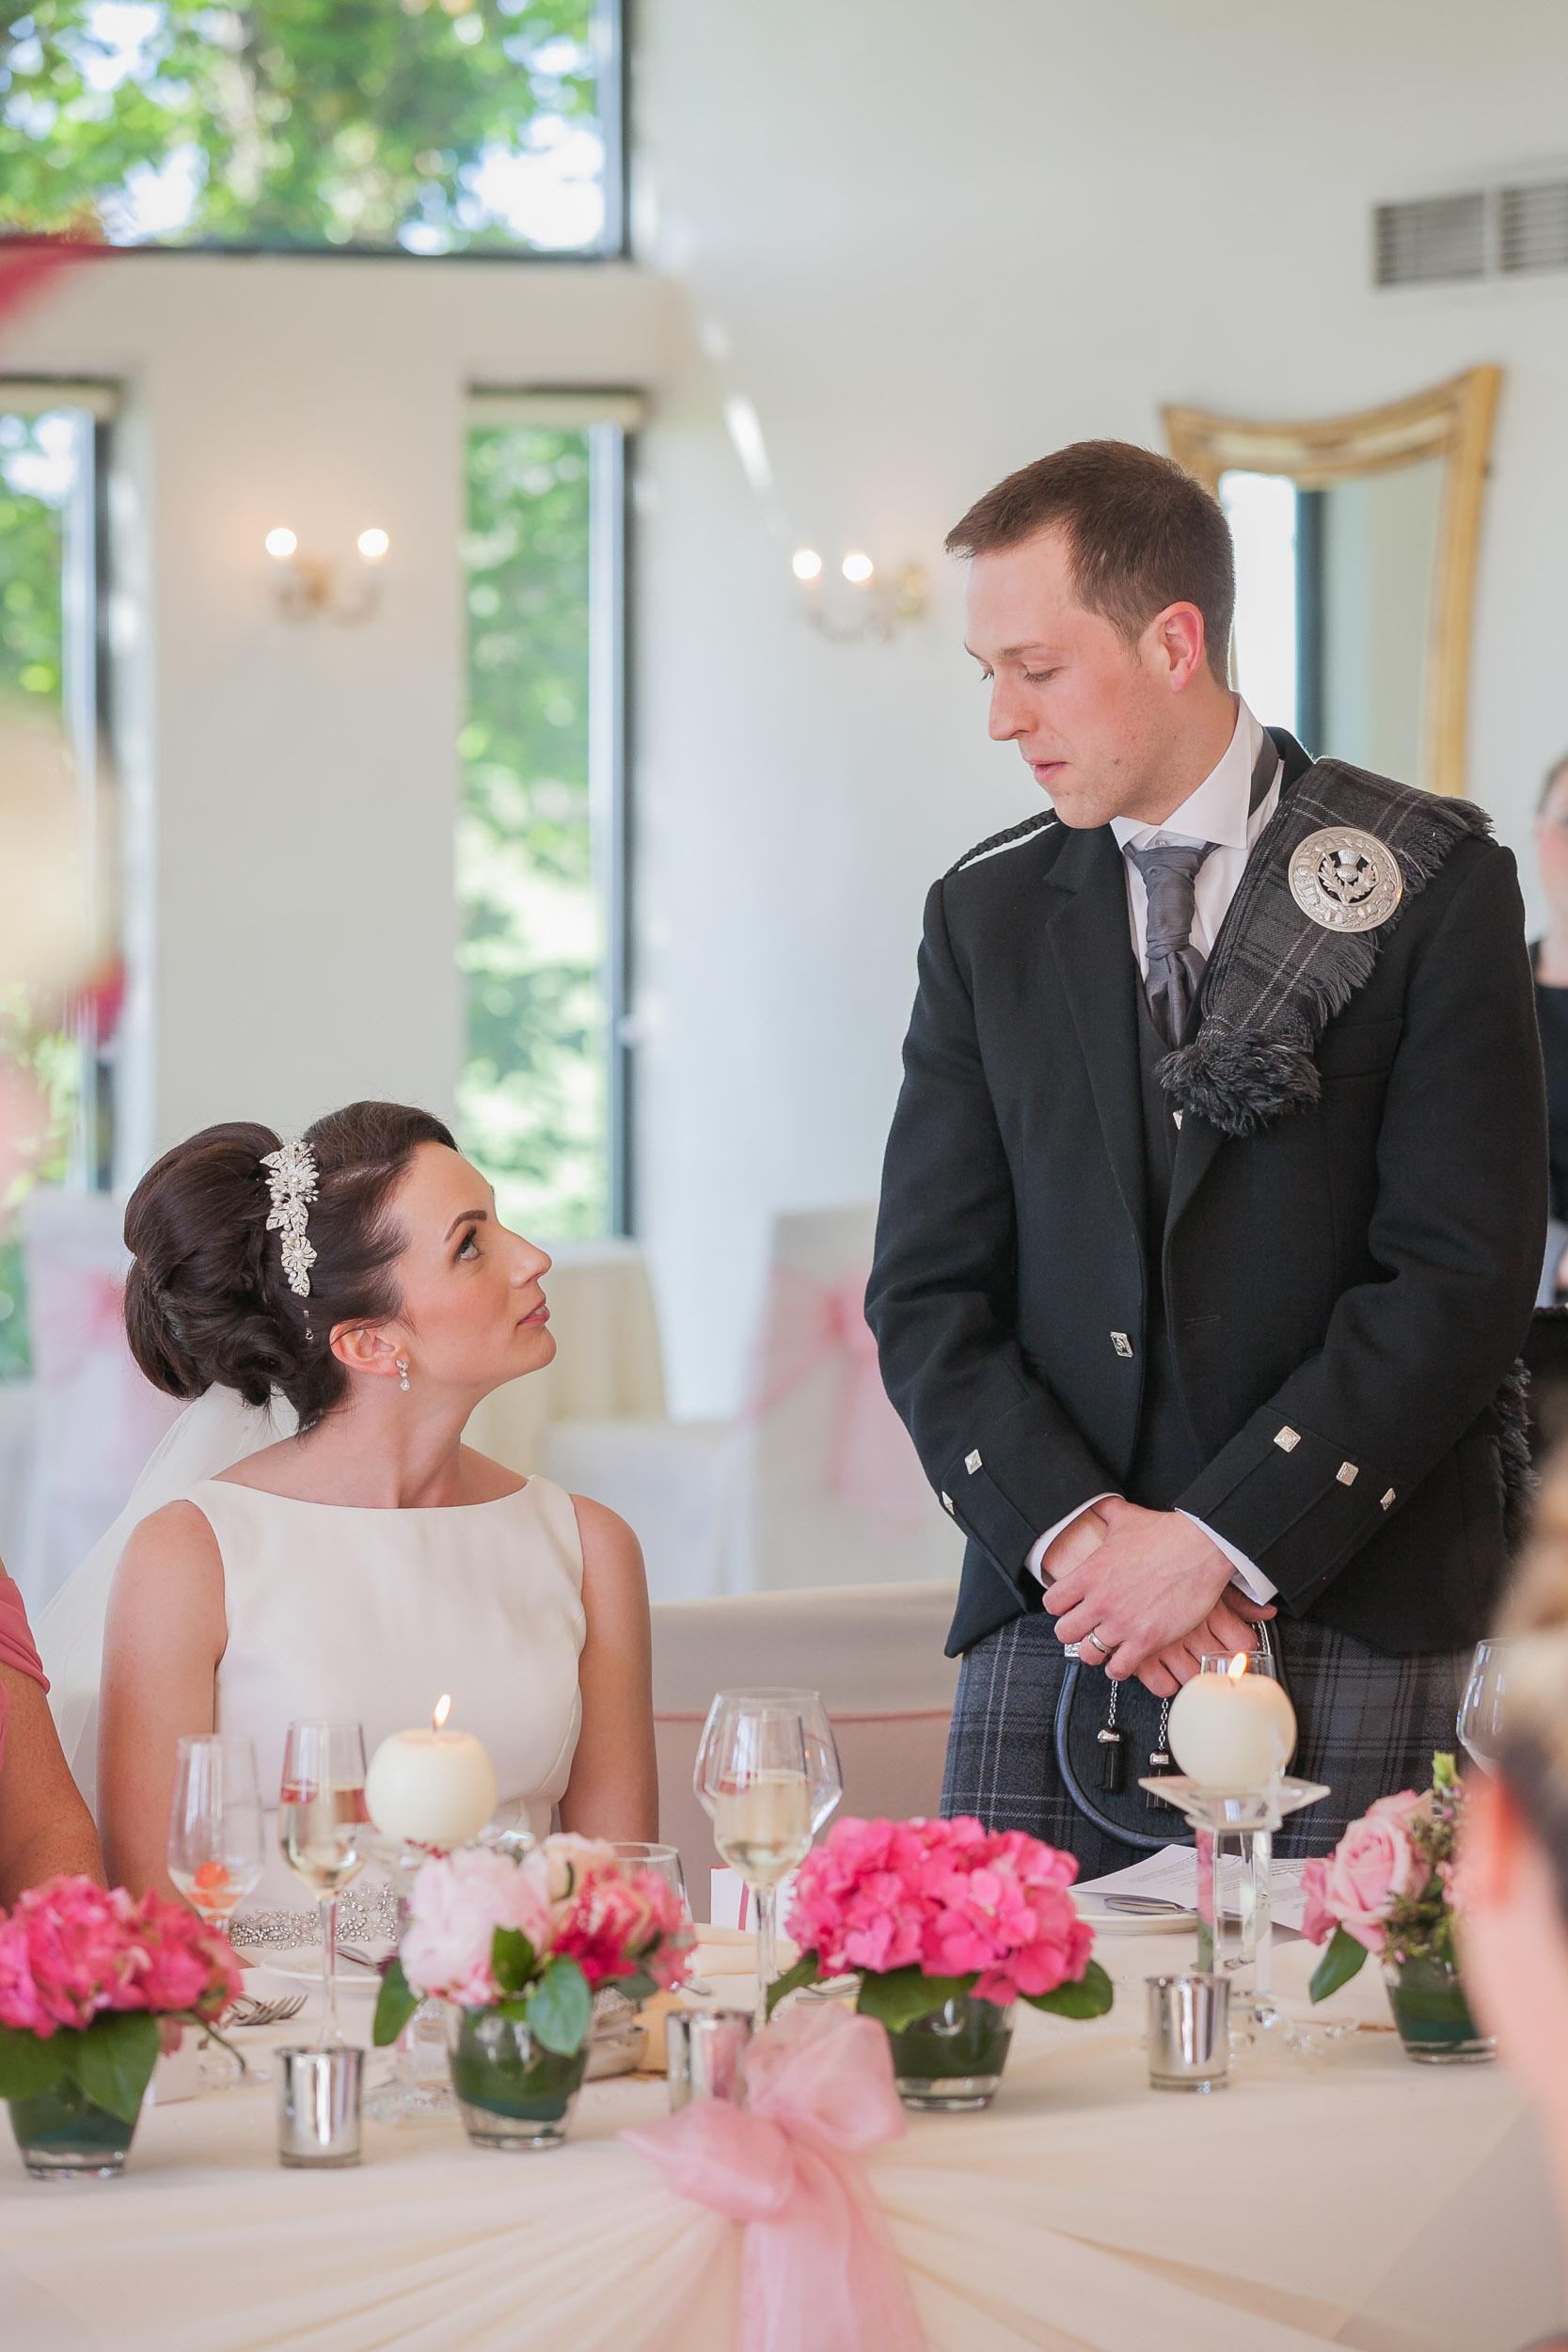 April & Chris-Wedding-West Tower-photo-0463.jpg